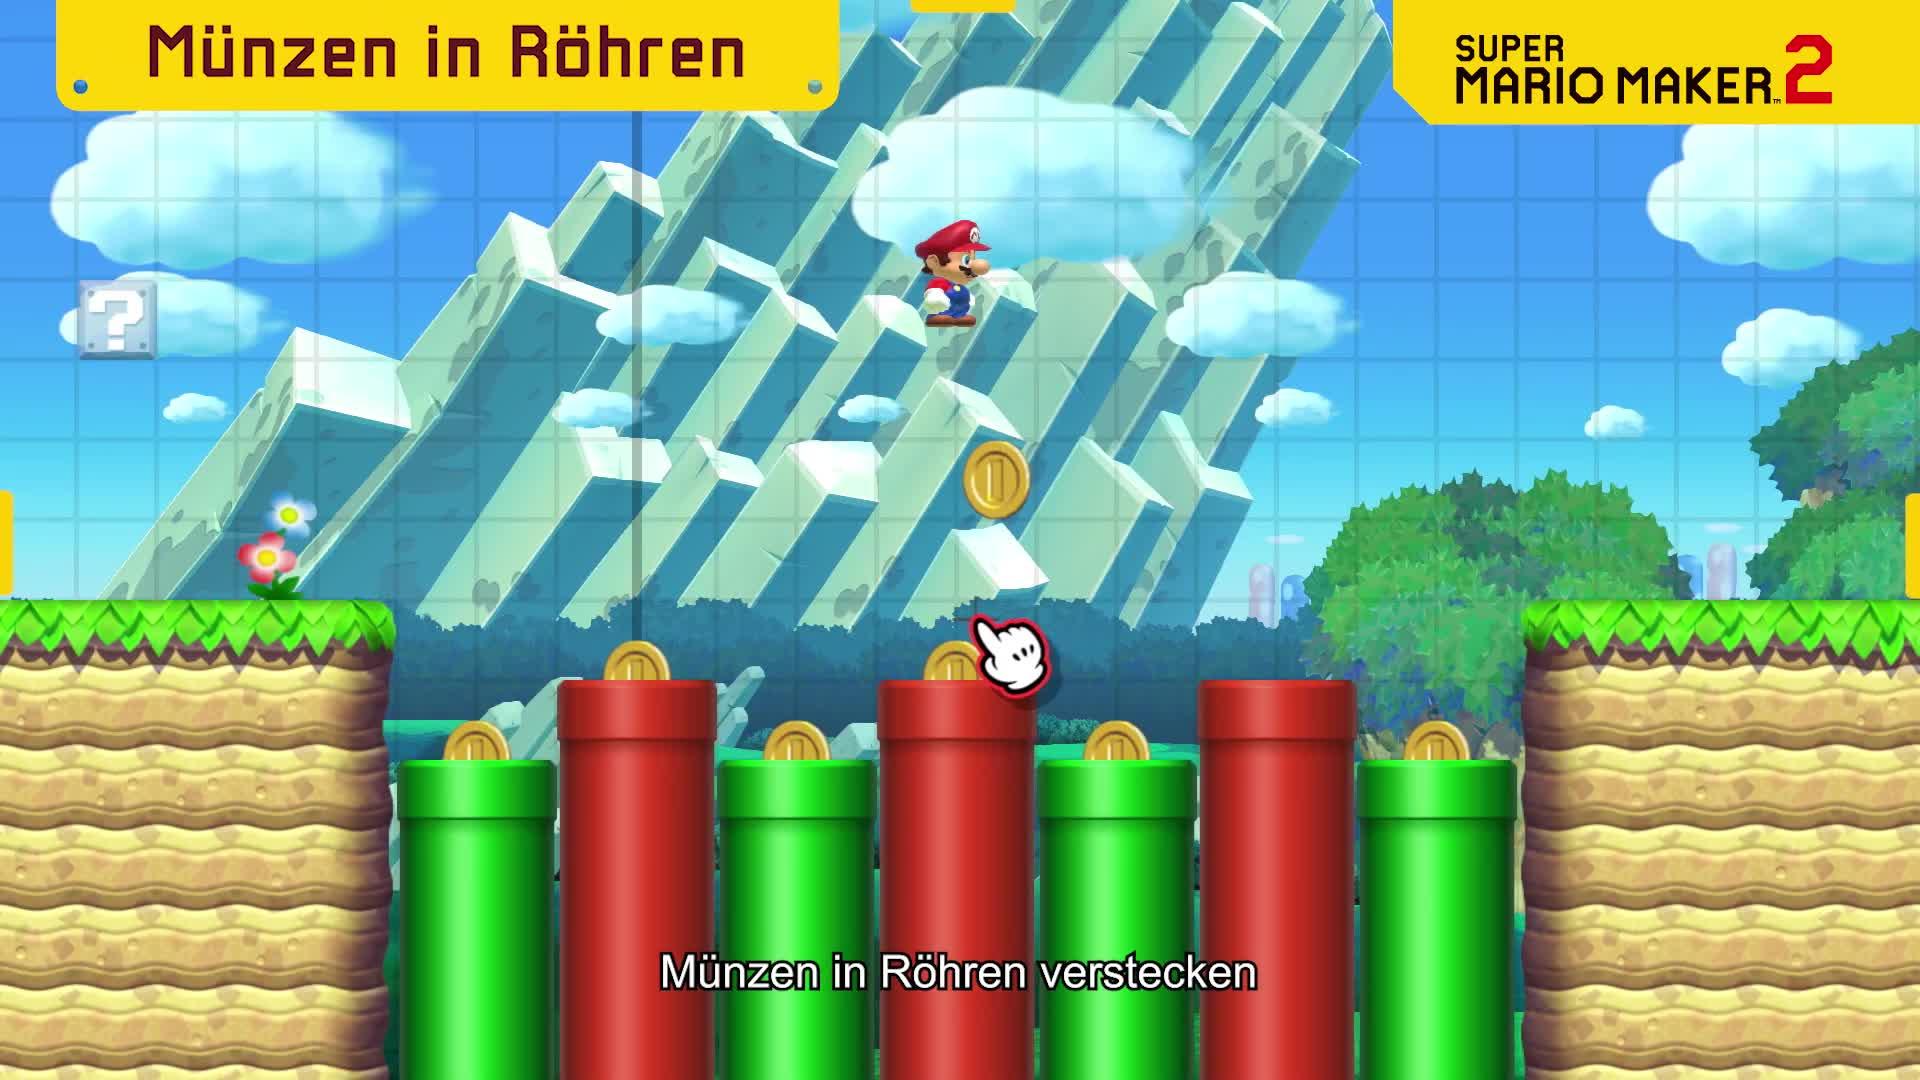 Trailer, Nintendo, Nintendo Switch, Mario Maker, Super Mario Maker, Super Mario Maker 2